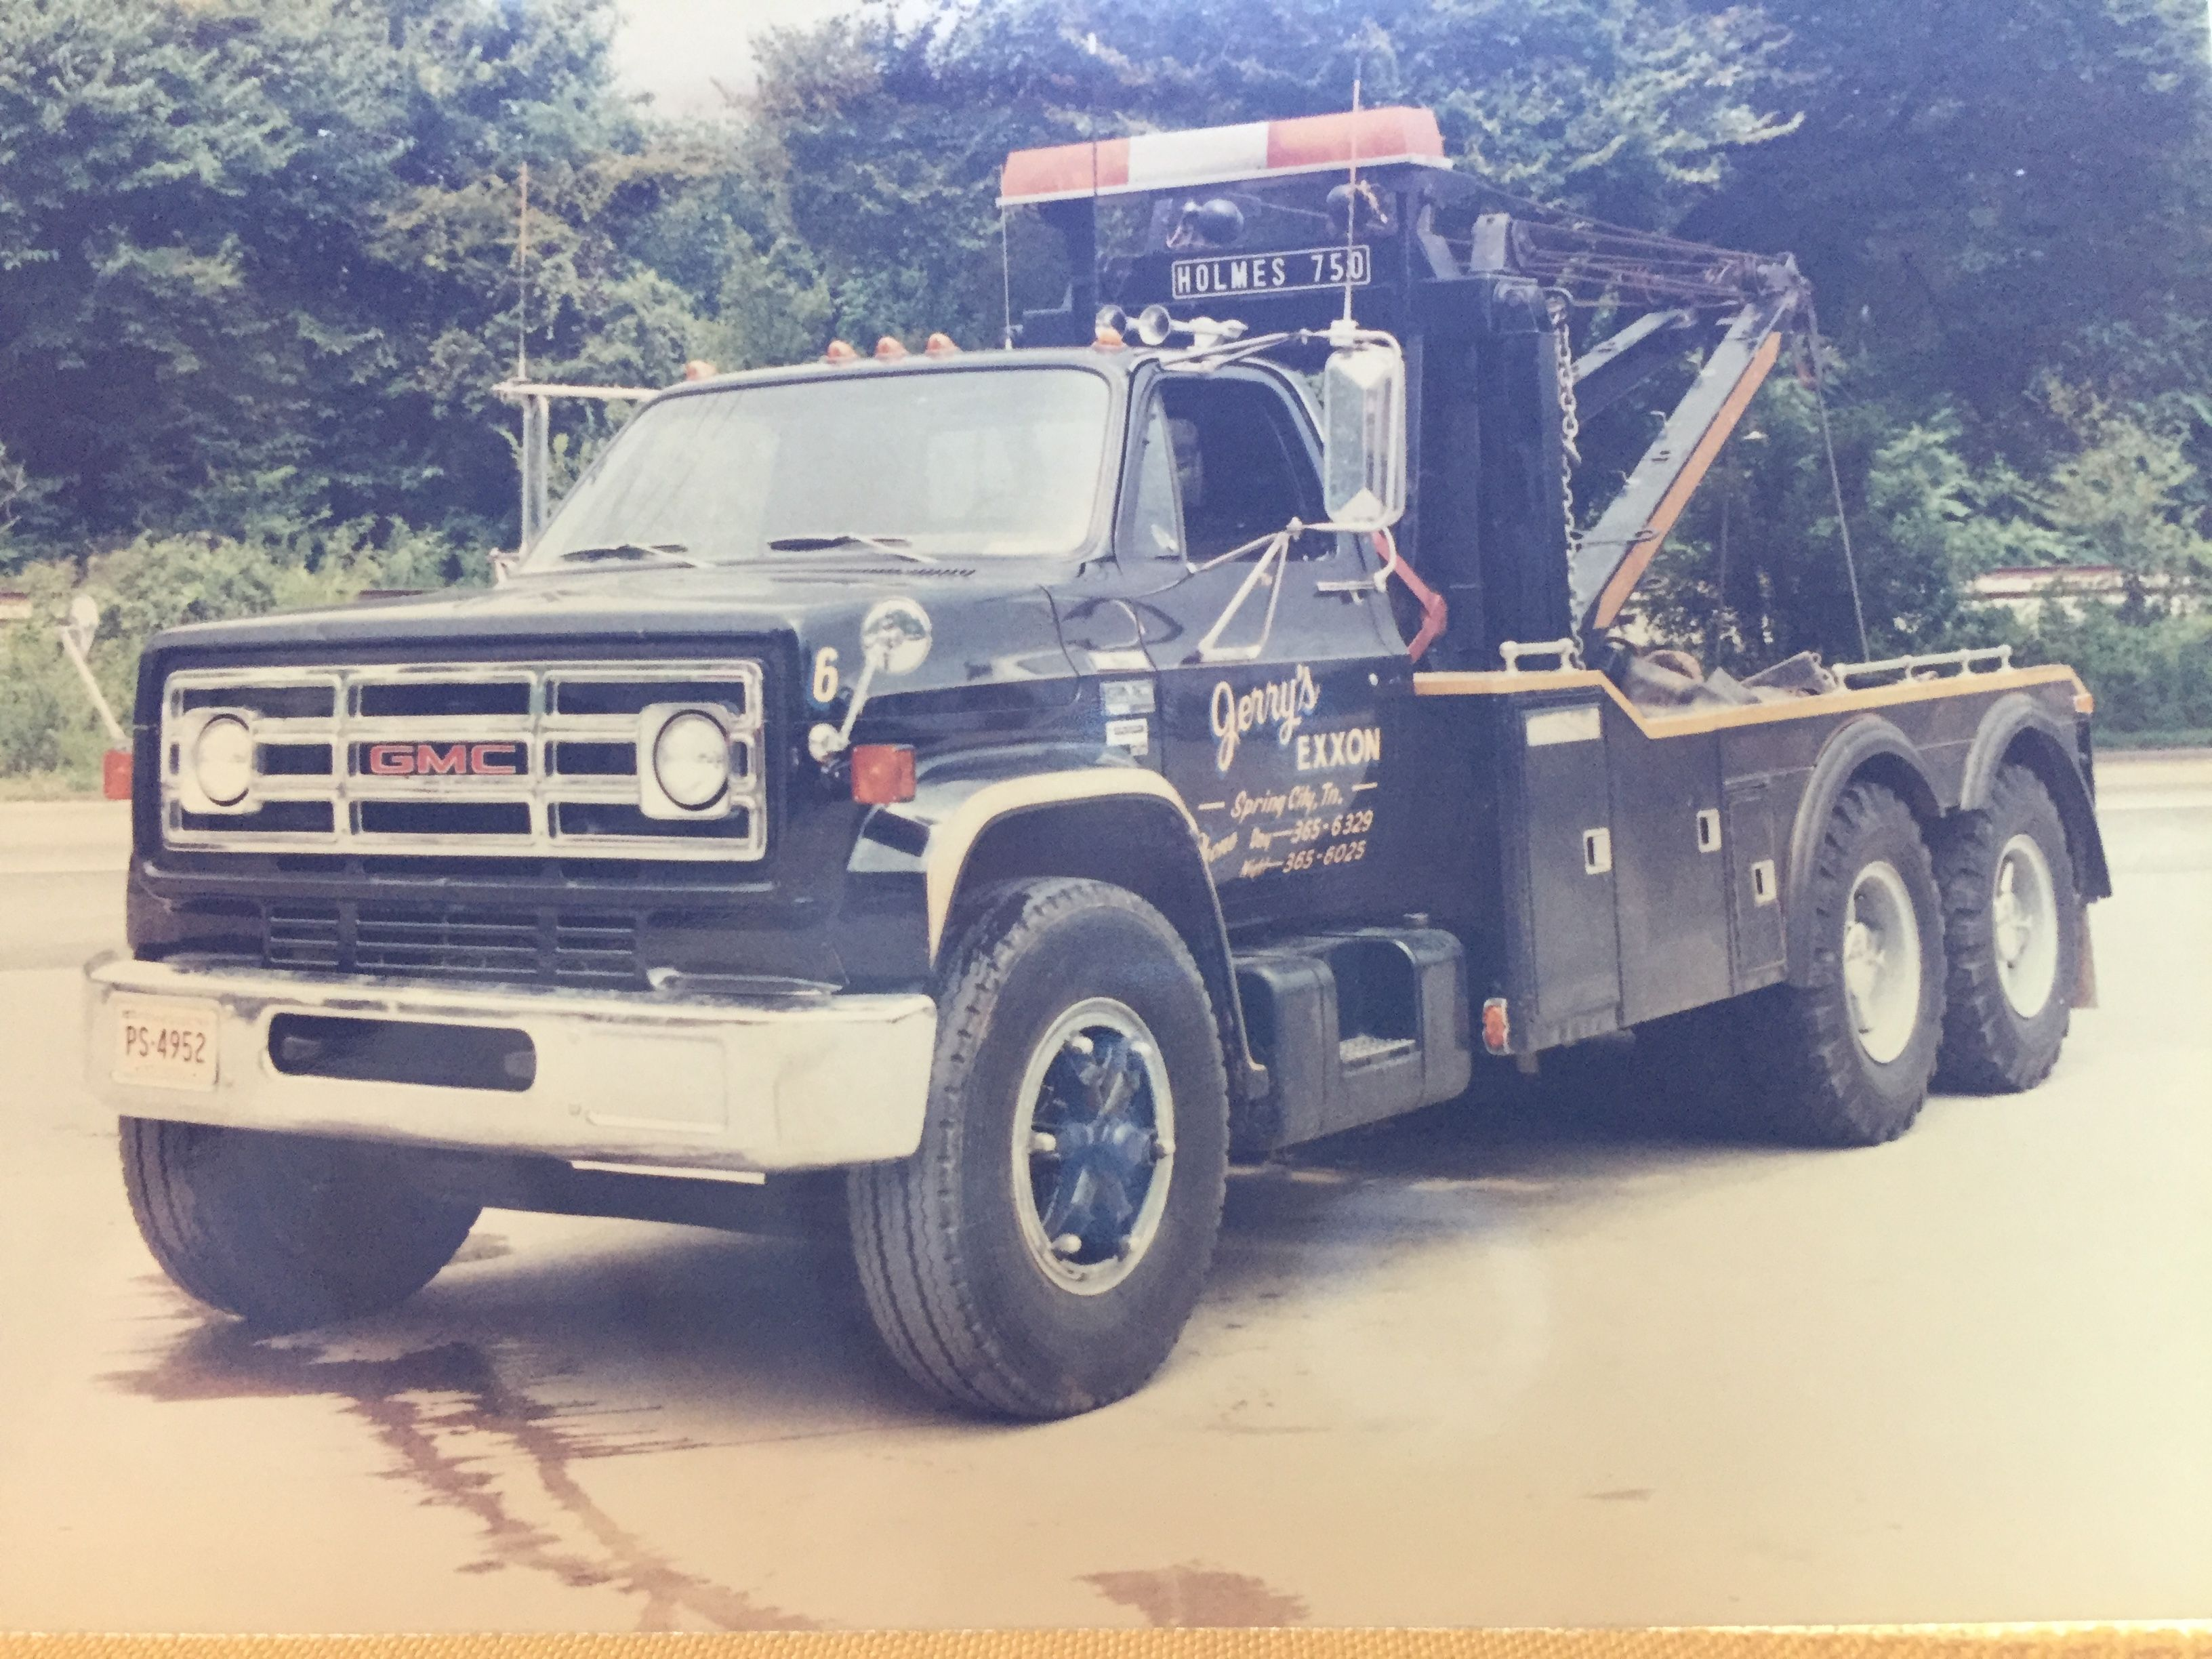 Pin by junkyard donut on gm | Pinterest | Tow truck, General motors ...